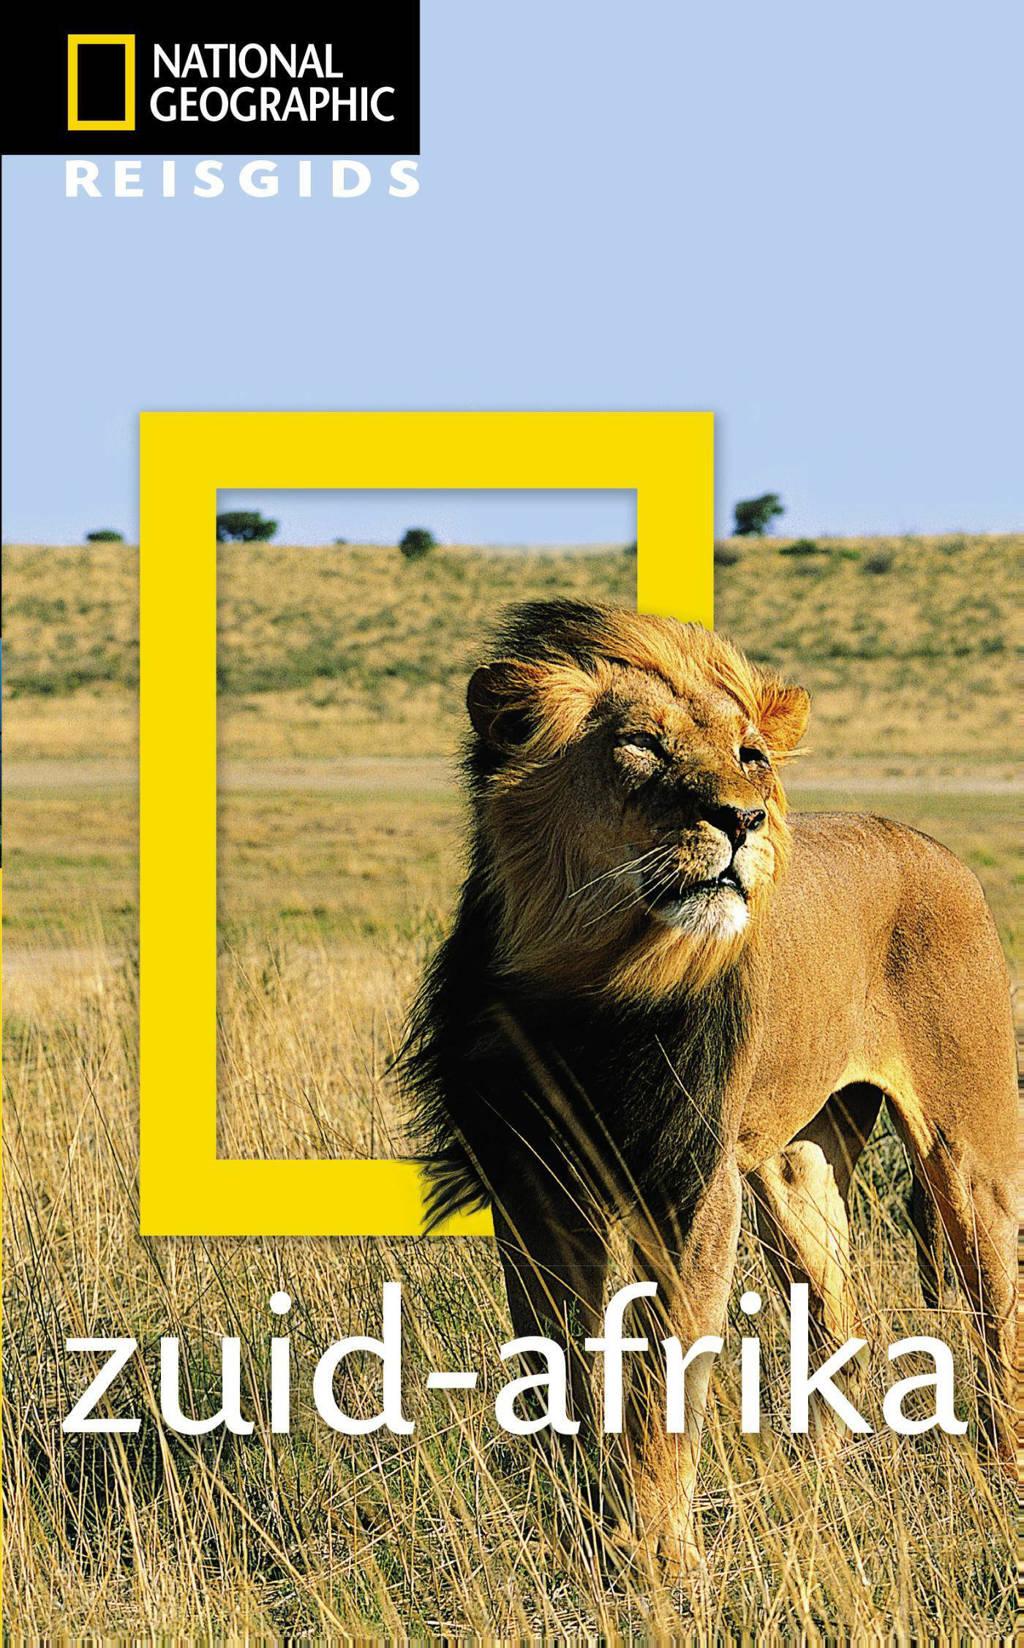 National Geographic Reisgids: Zuid-Afrika - National Geographic Reisgids